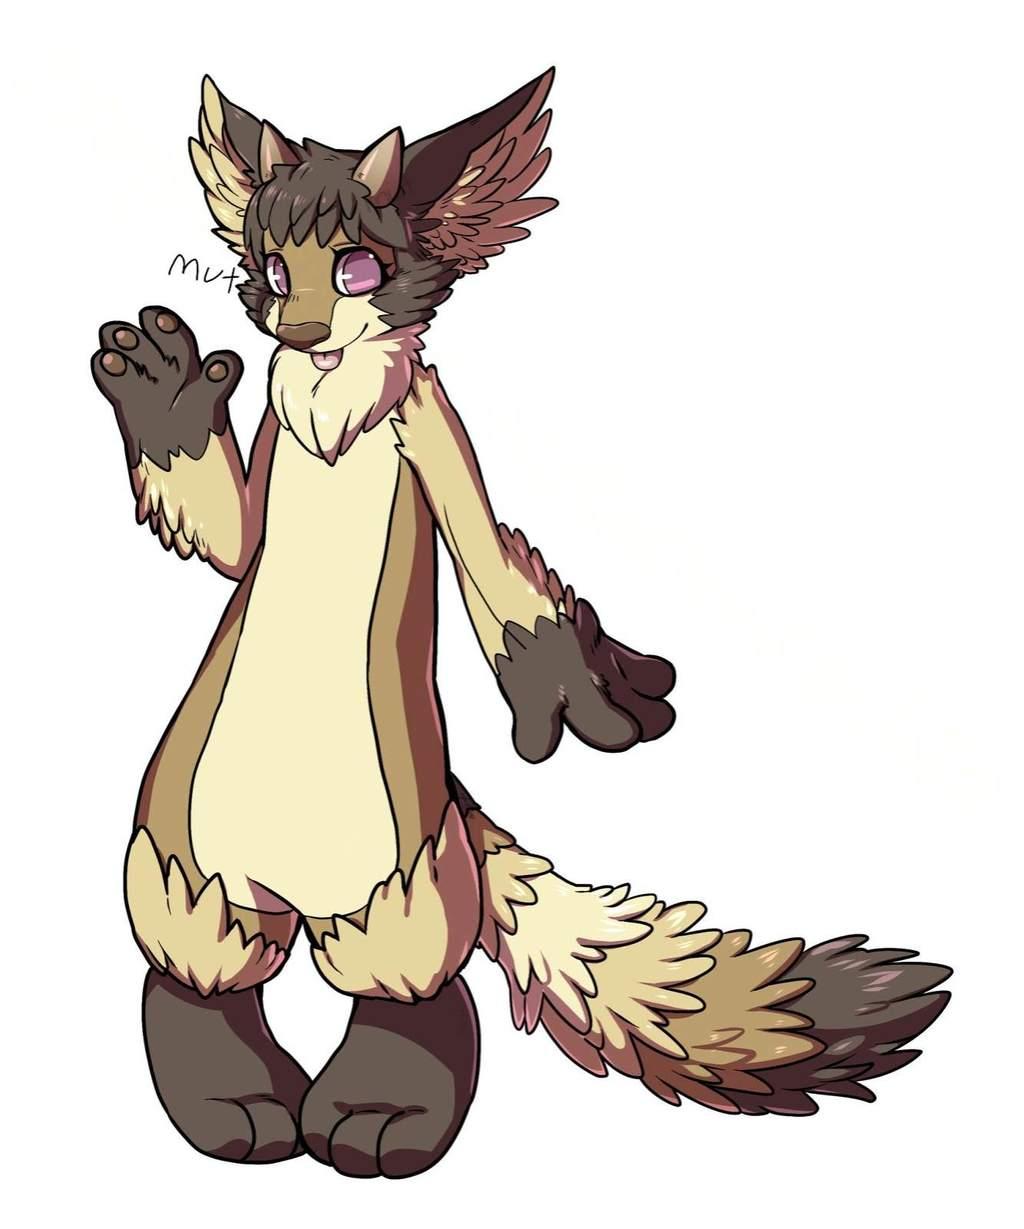 Most recent character: Mutoreo (Laylix)